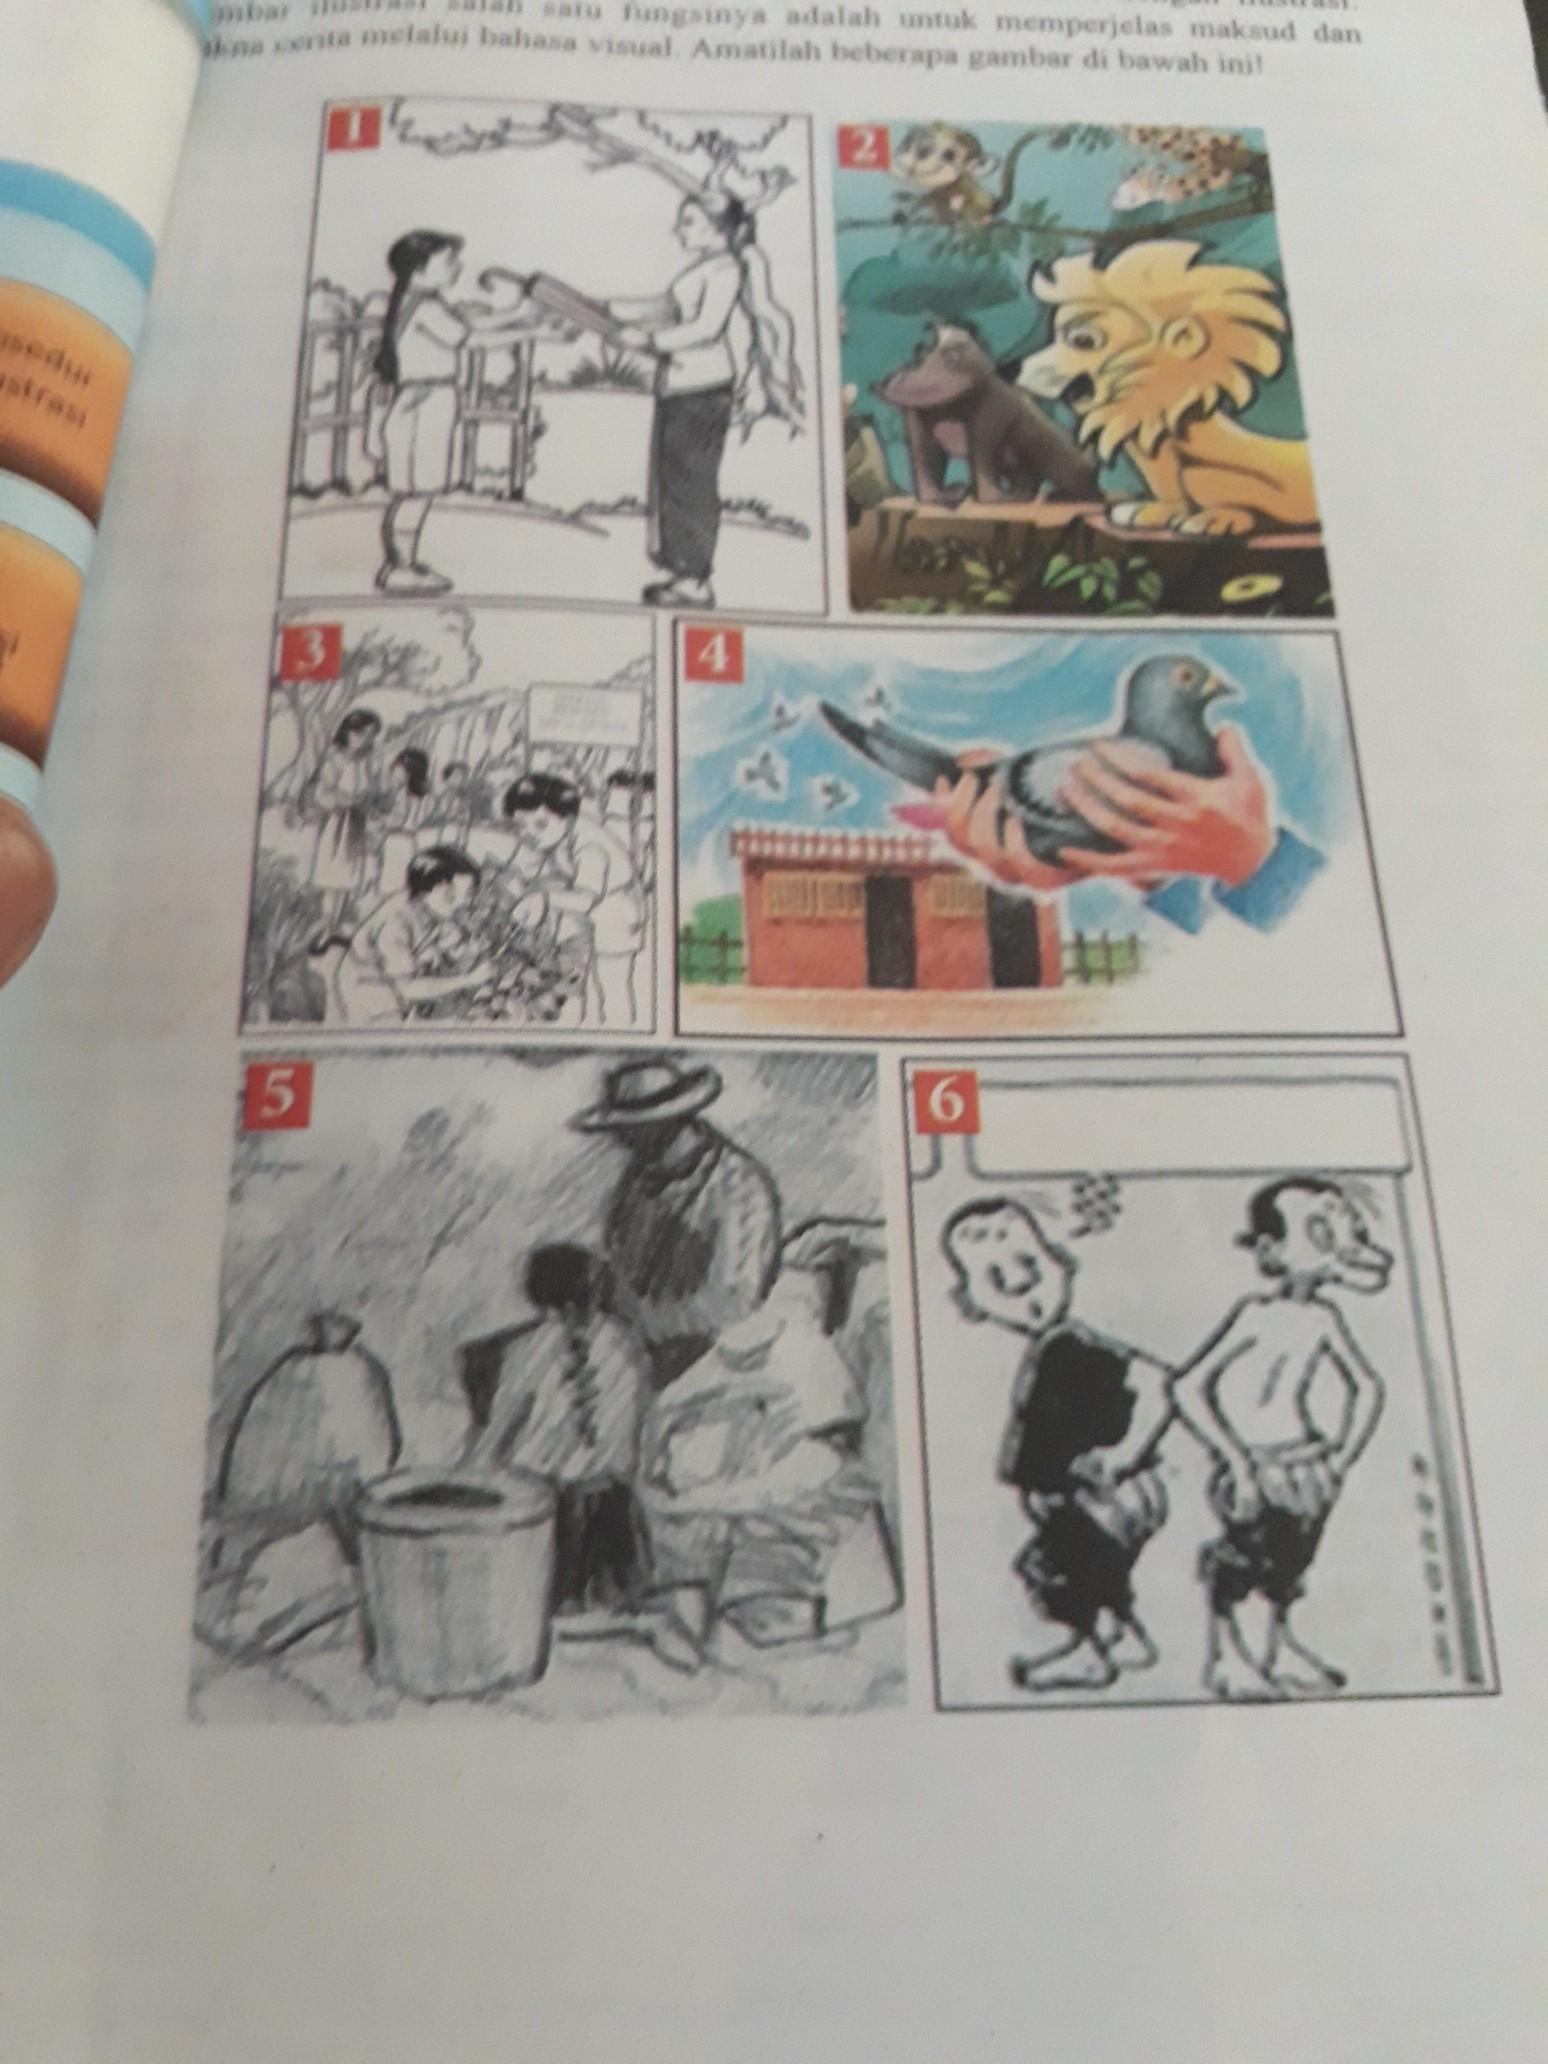 Apa Arti 5 Gambar Ilustrasi Di Atas Brainly Co Id